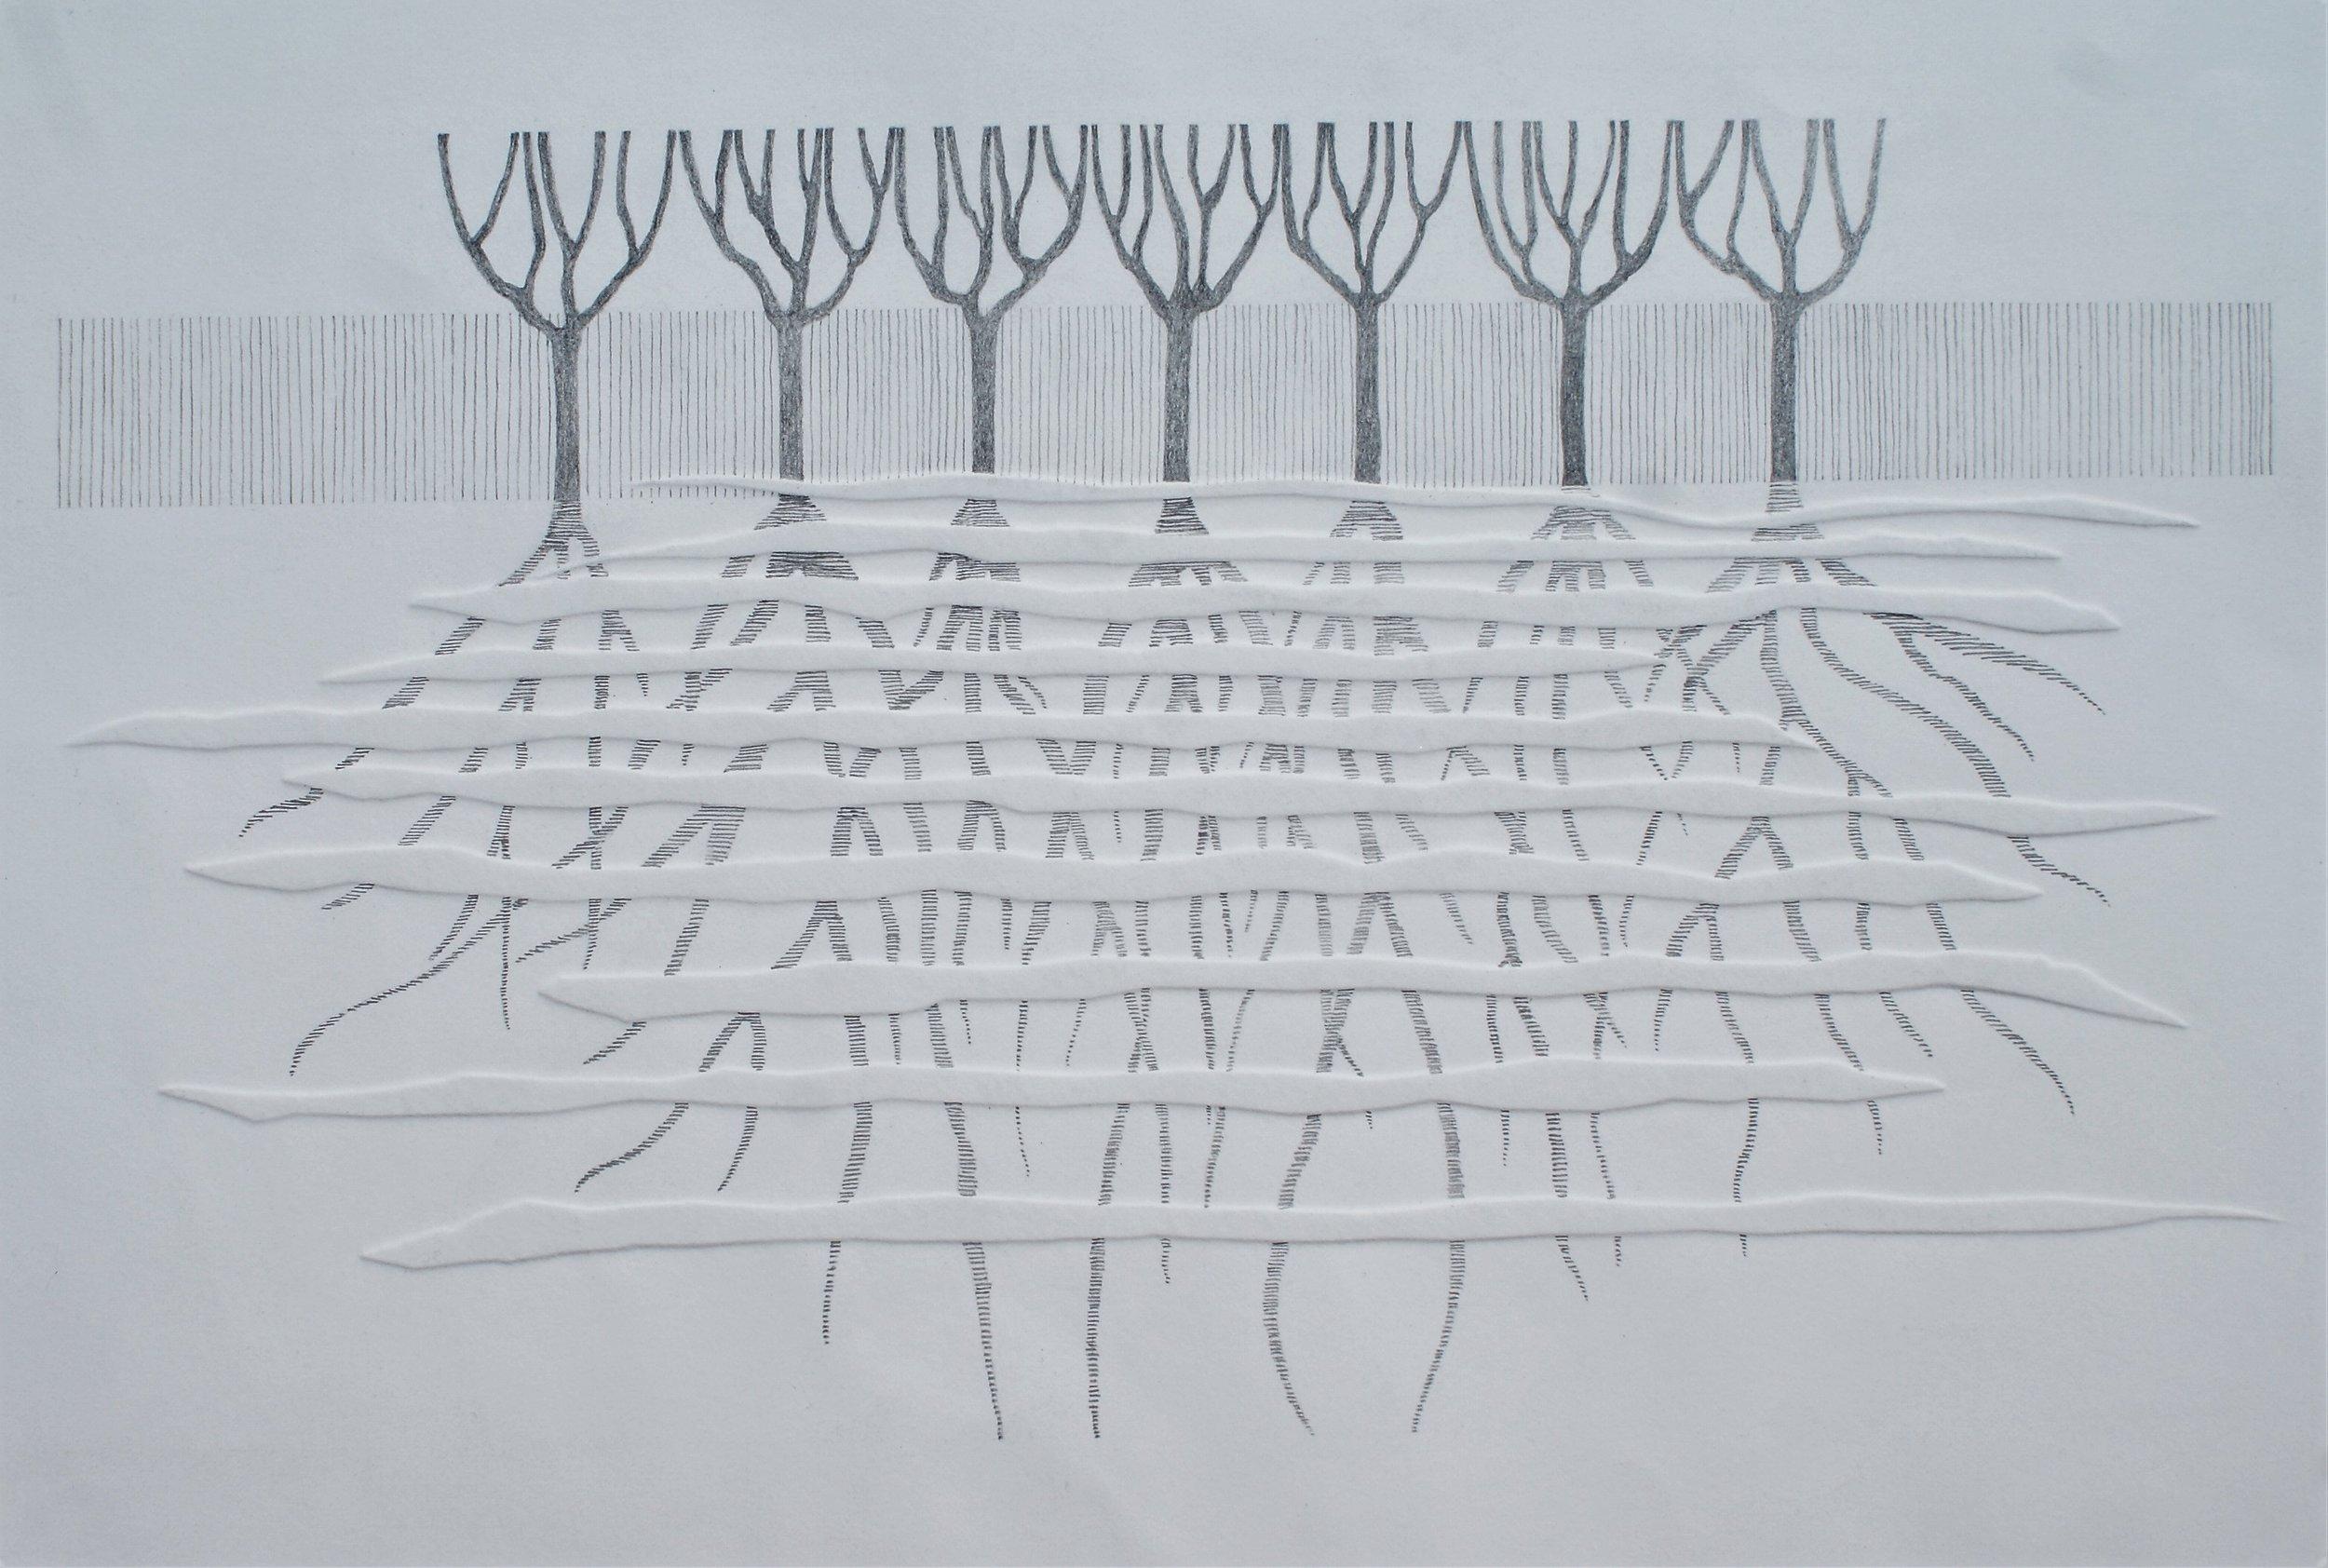 Boomwortels II, 2018 (blinddruk, potlood) 60 cm x 43,5 cm